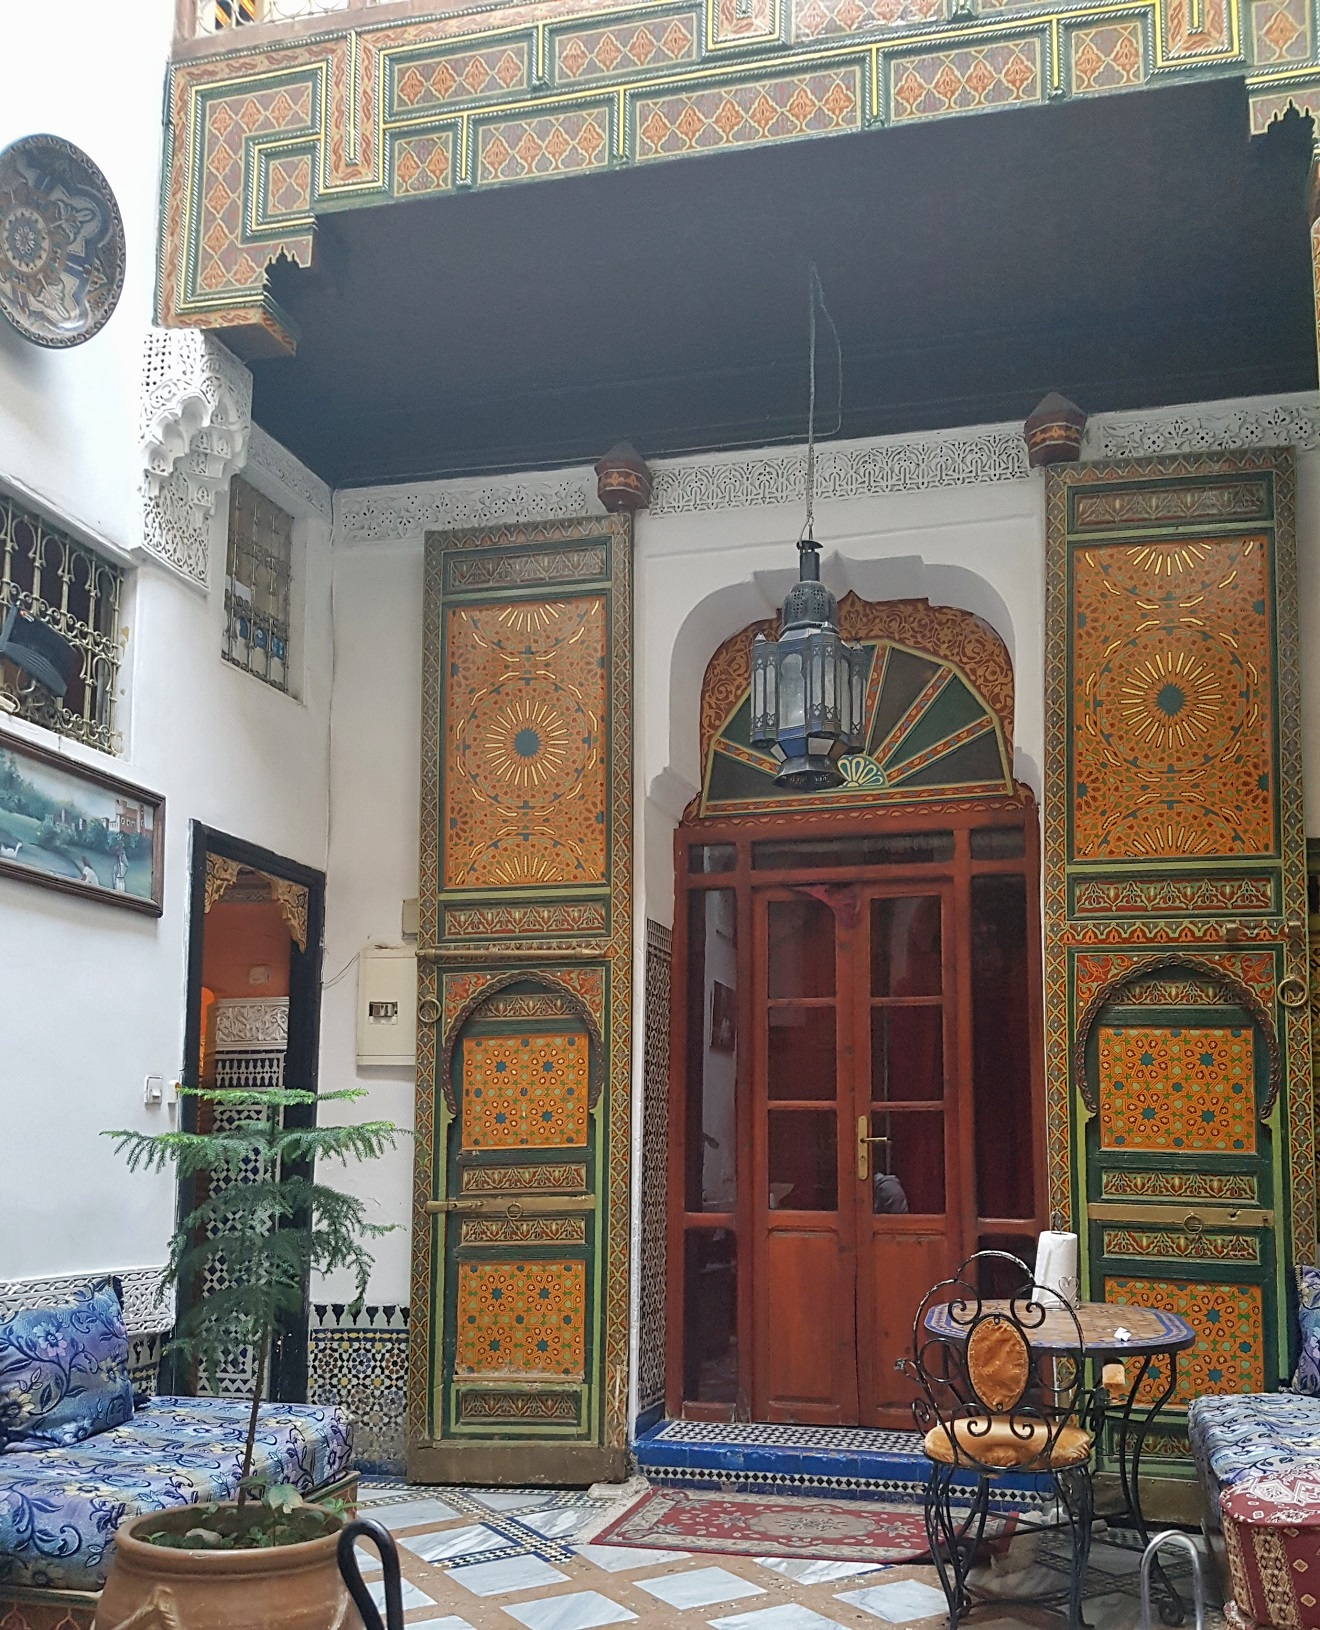 fez morocco, maroko, fes